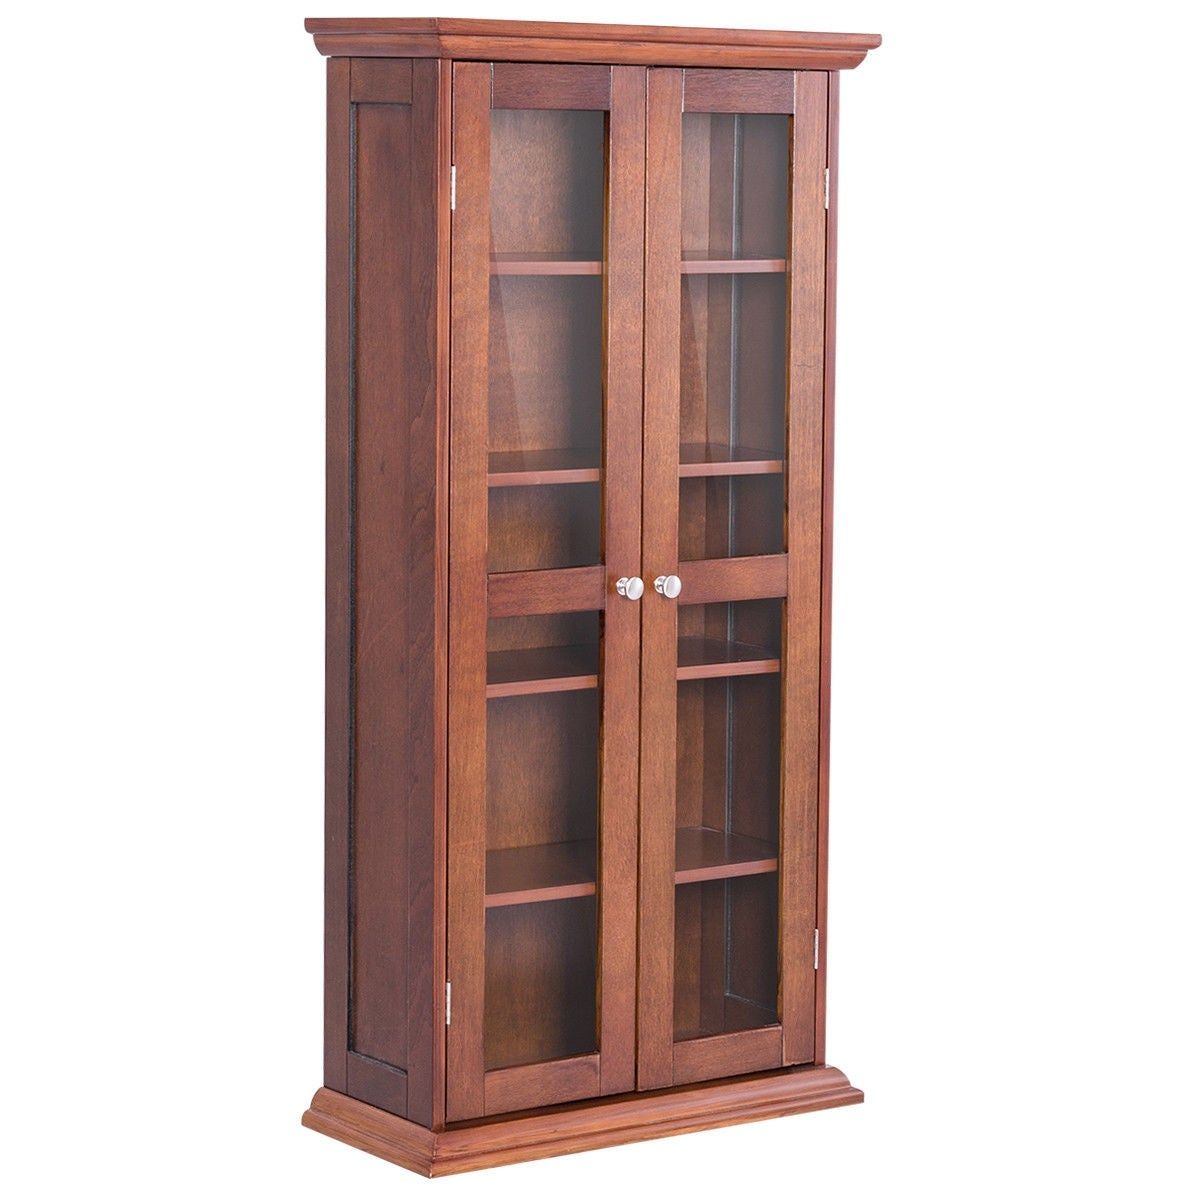 Shop Costway 445 Wood Media Storage Cabinet Cd Dvd Shelves Tower